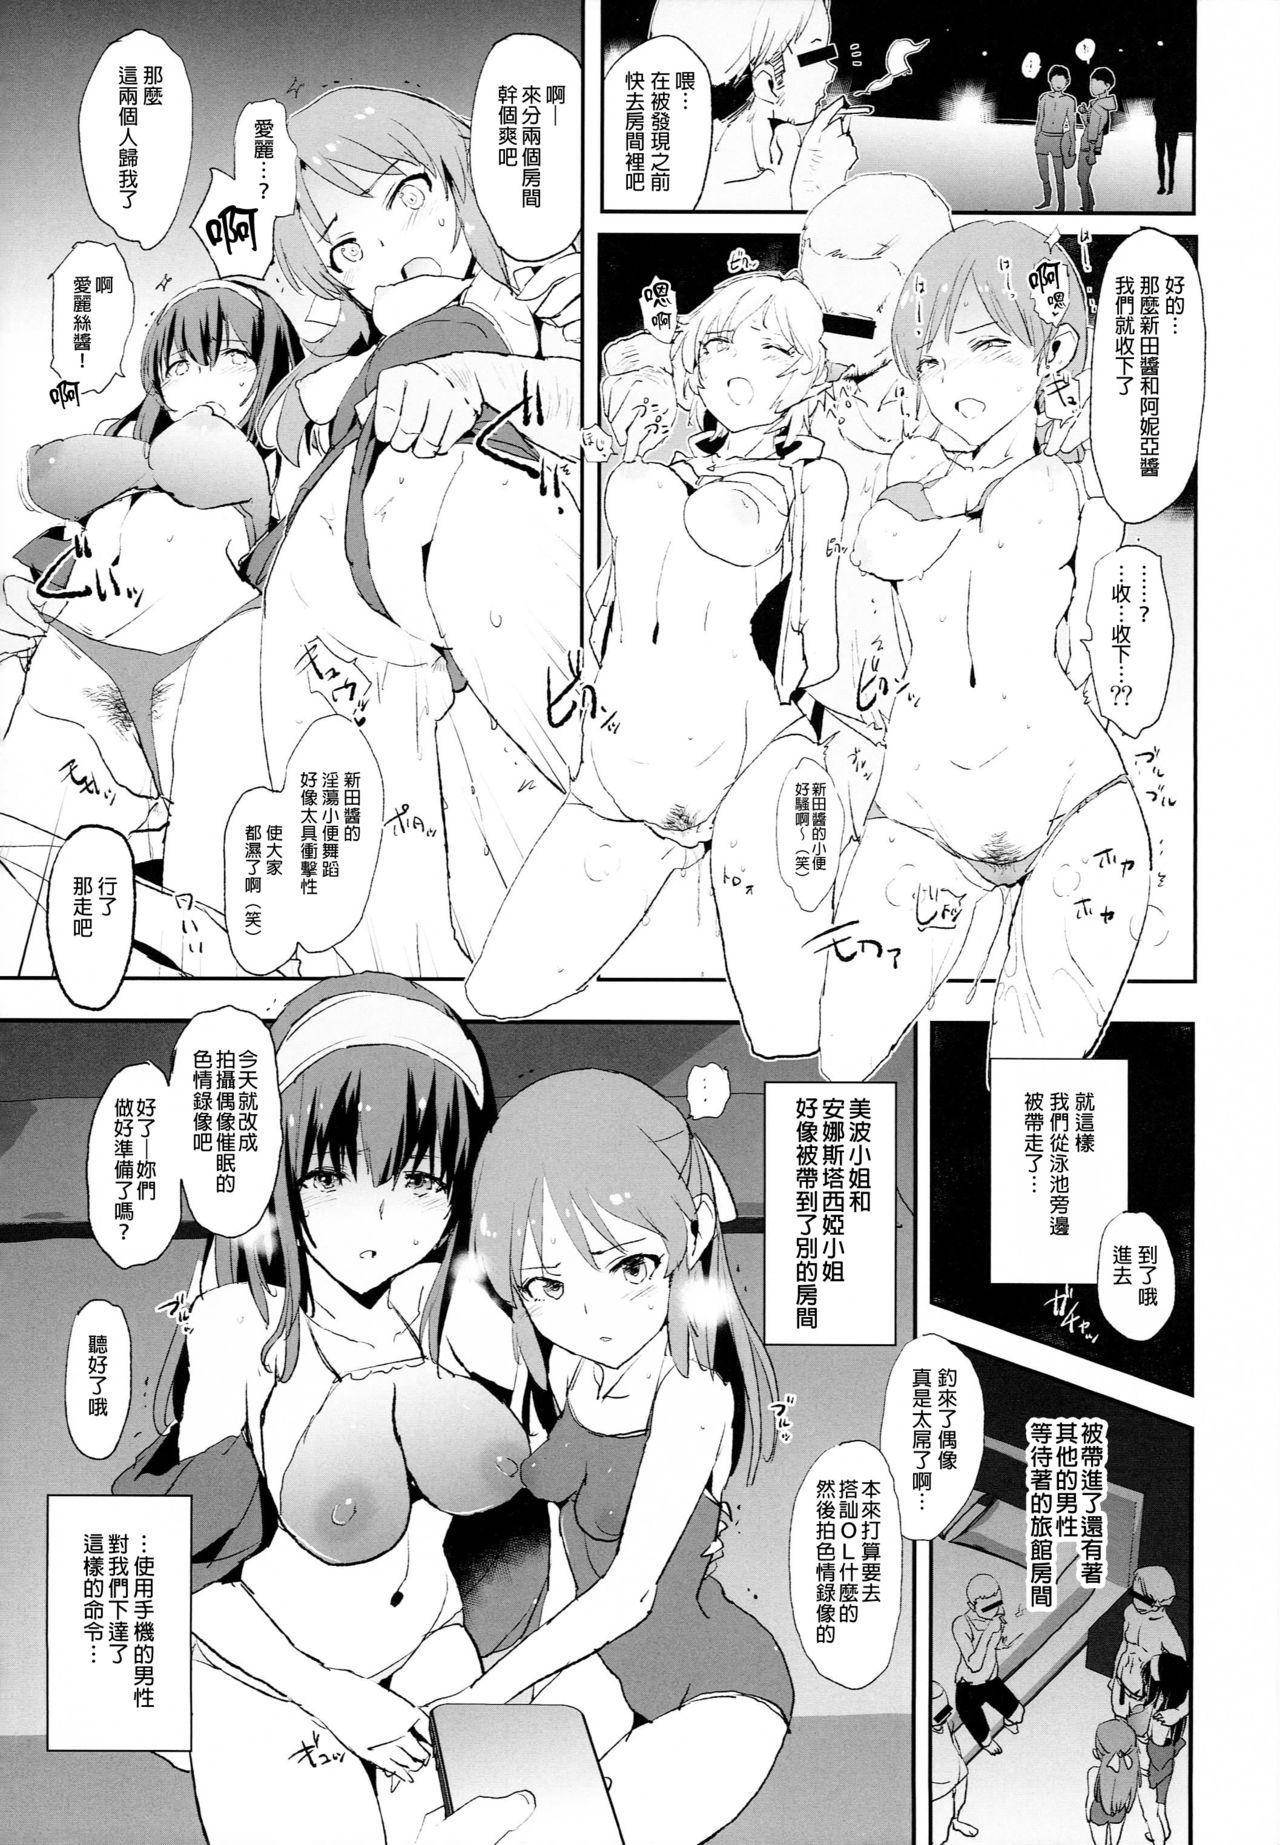 Tachibana Arisu no Saimin Dosukebe Sex Friends with Sagisawa Fumika + Omake Paper 5